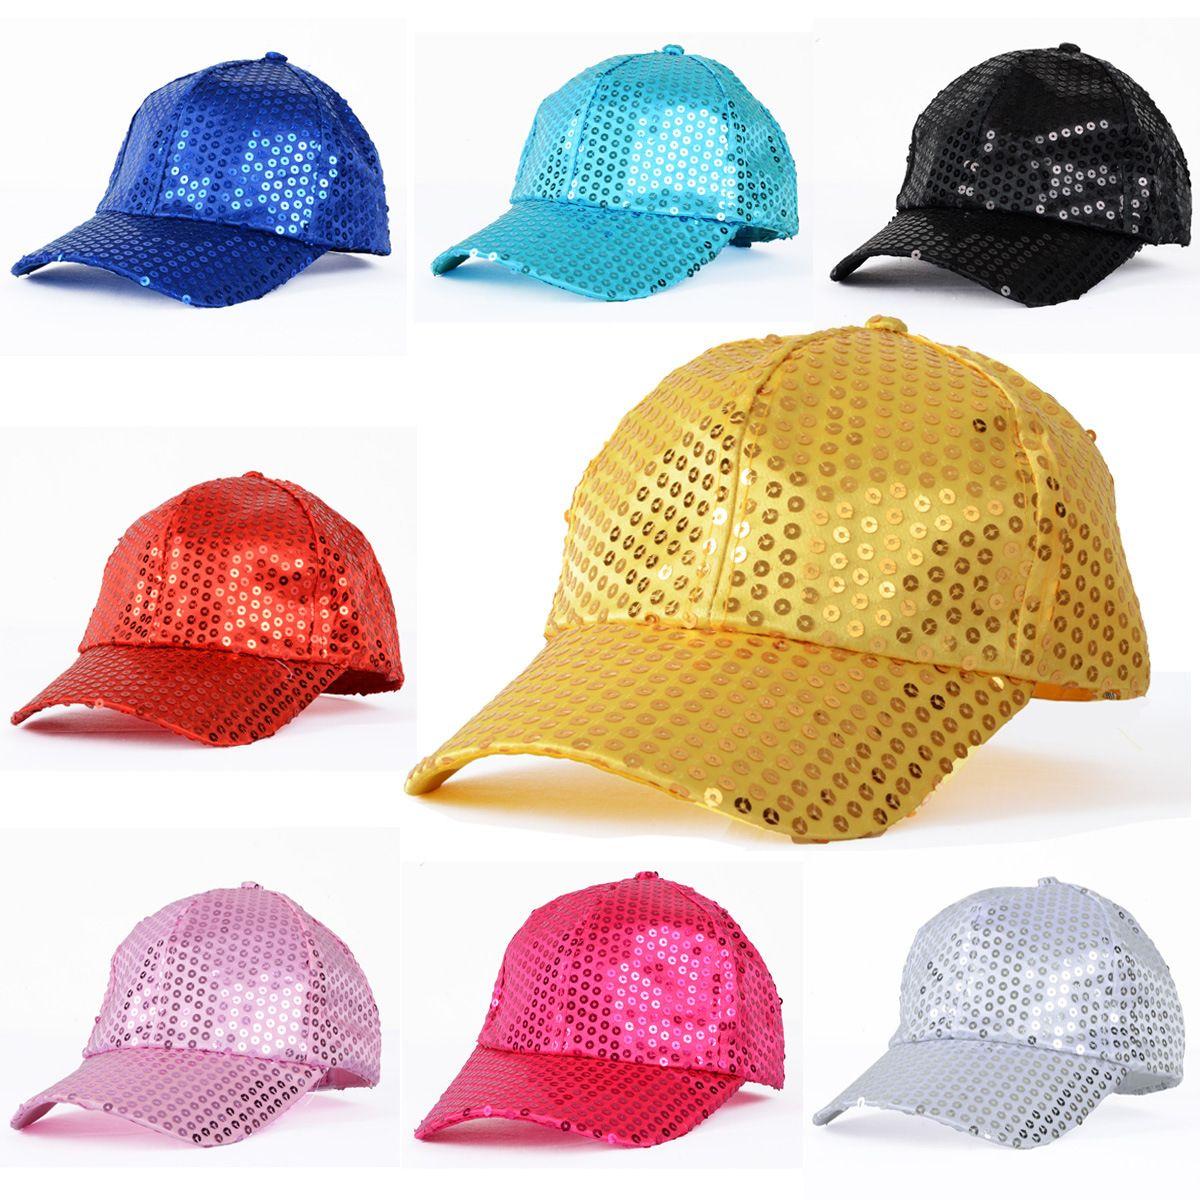 a2206f24ed7 Women Men Shining Sequin Baseball Hat Sequined Glitter Dance Party Cap  Clubwear Hatland Brixton Hats From Artstyle